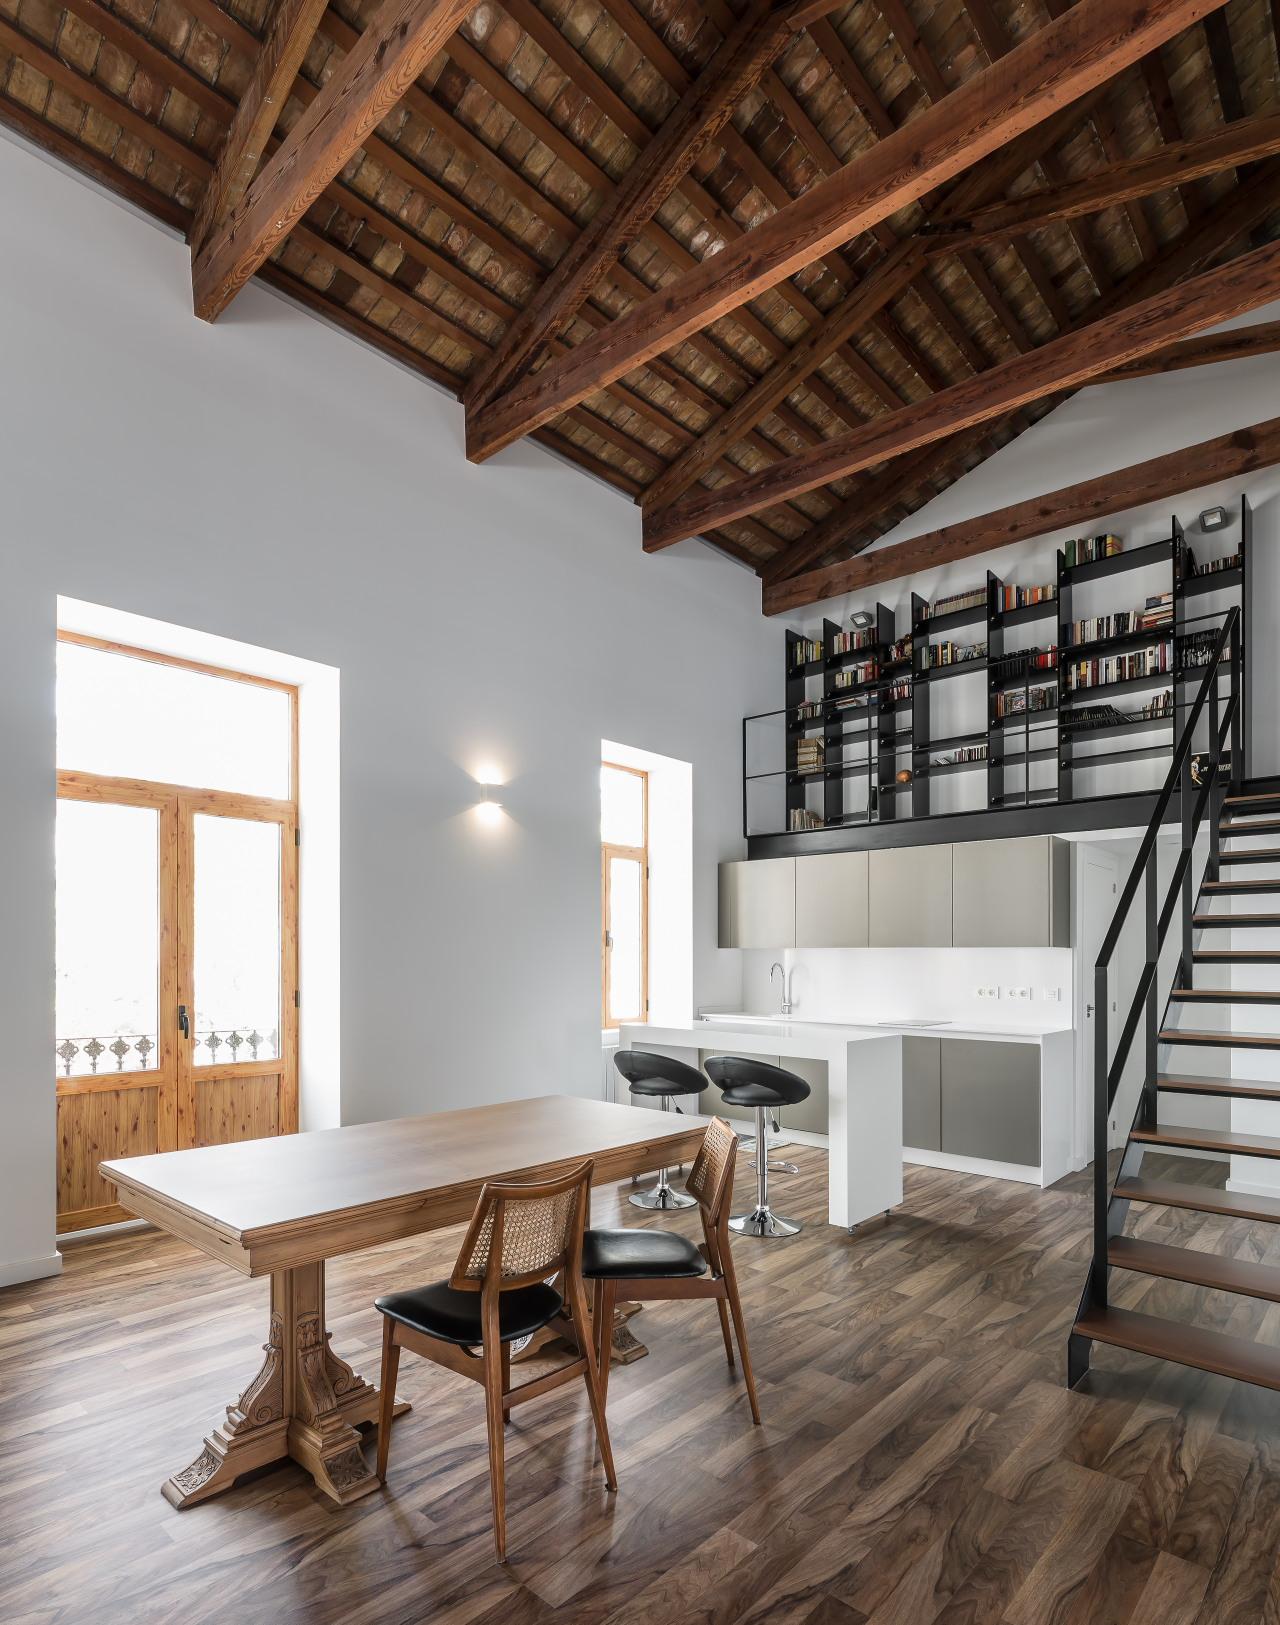 fotografia-arquitectura-valencia-german-cabo-viraje-rehabilitacion-campanar (34)